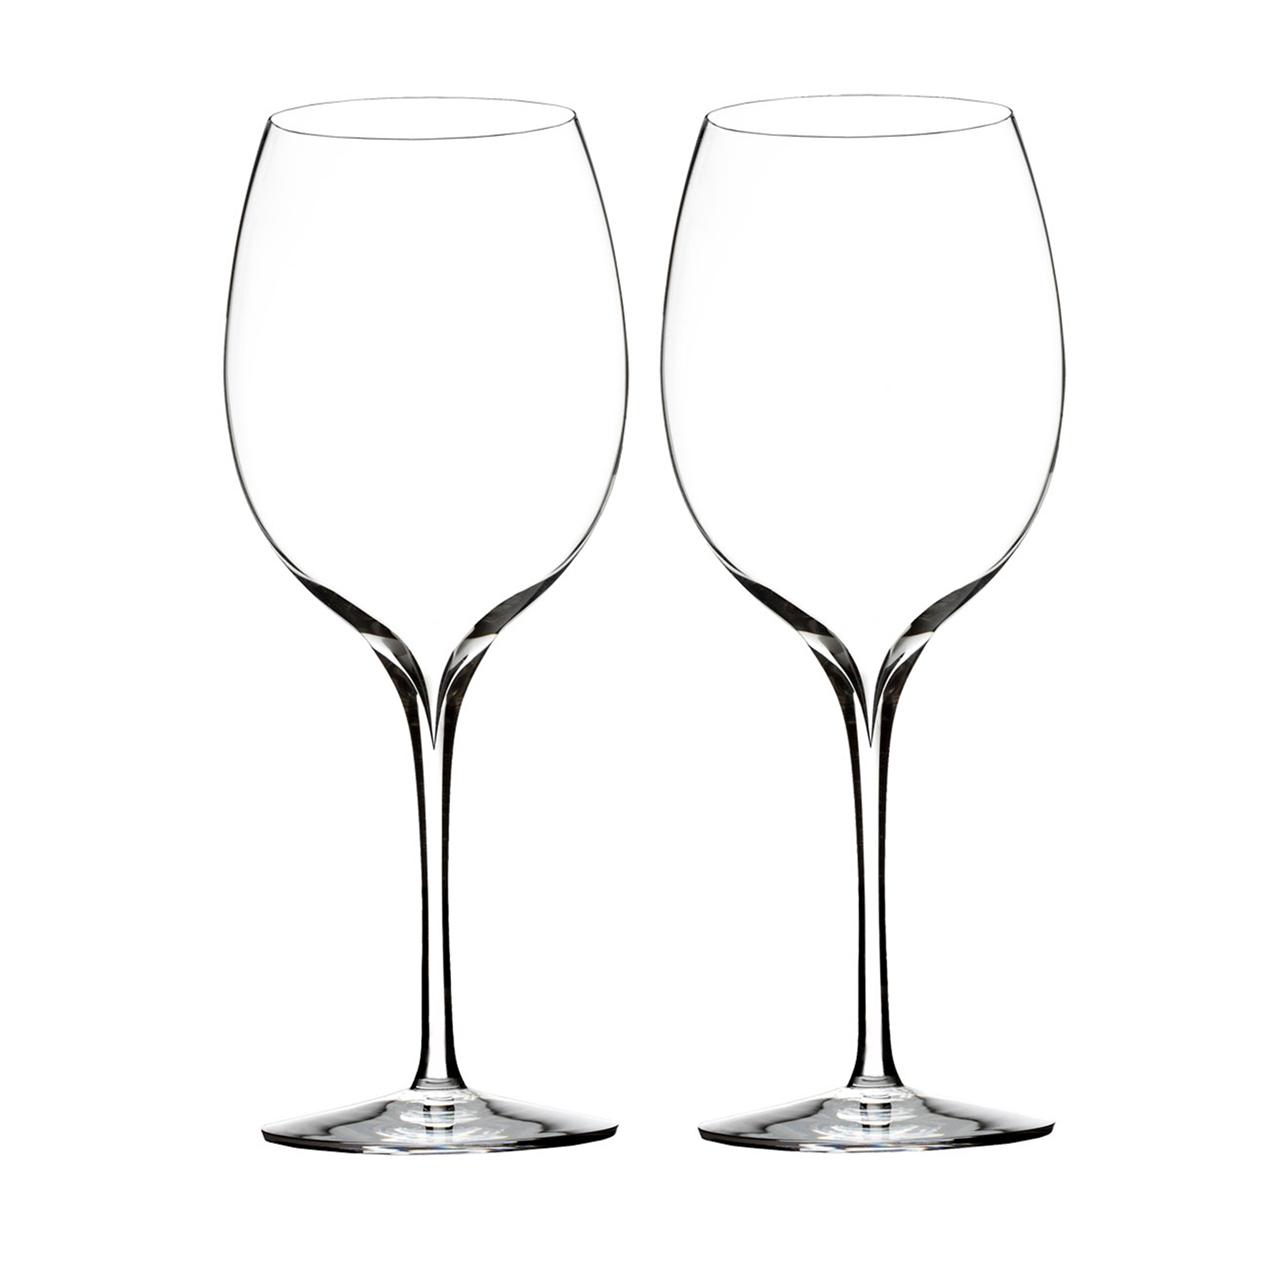 Elegance Pinot Grigio Wine Glass, Set of 2